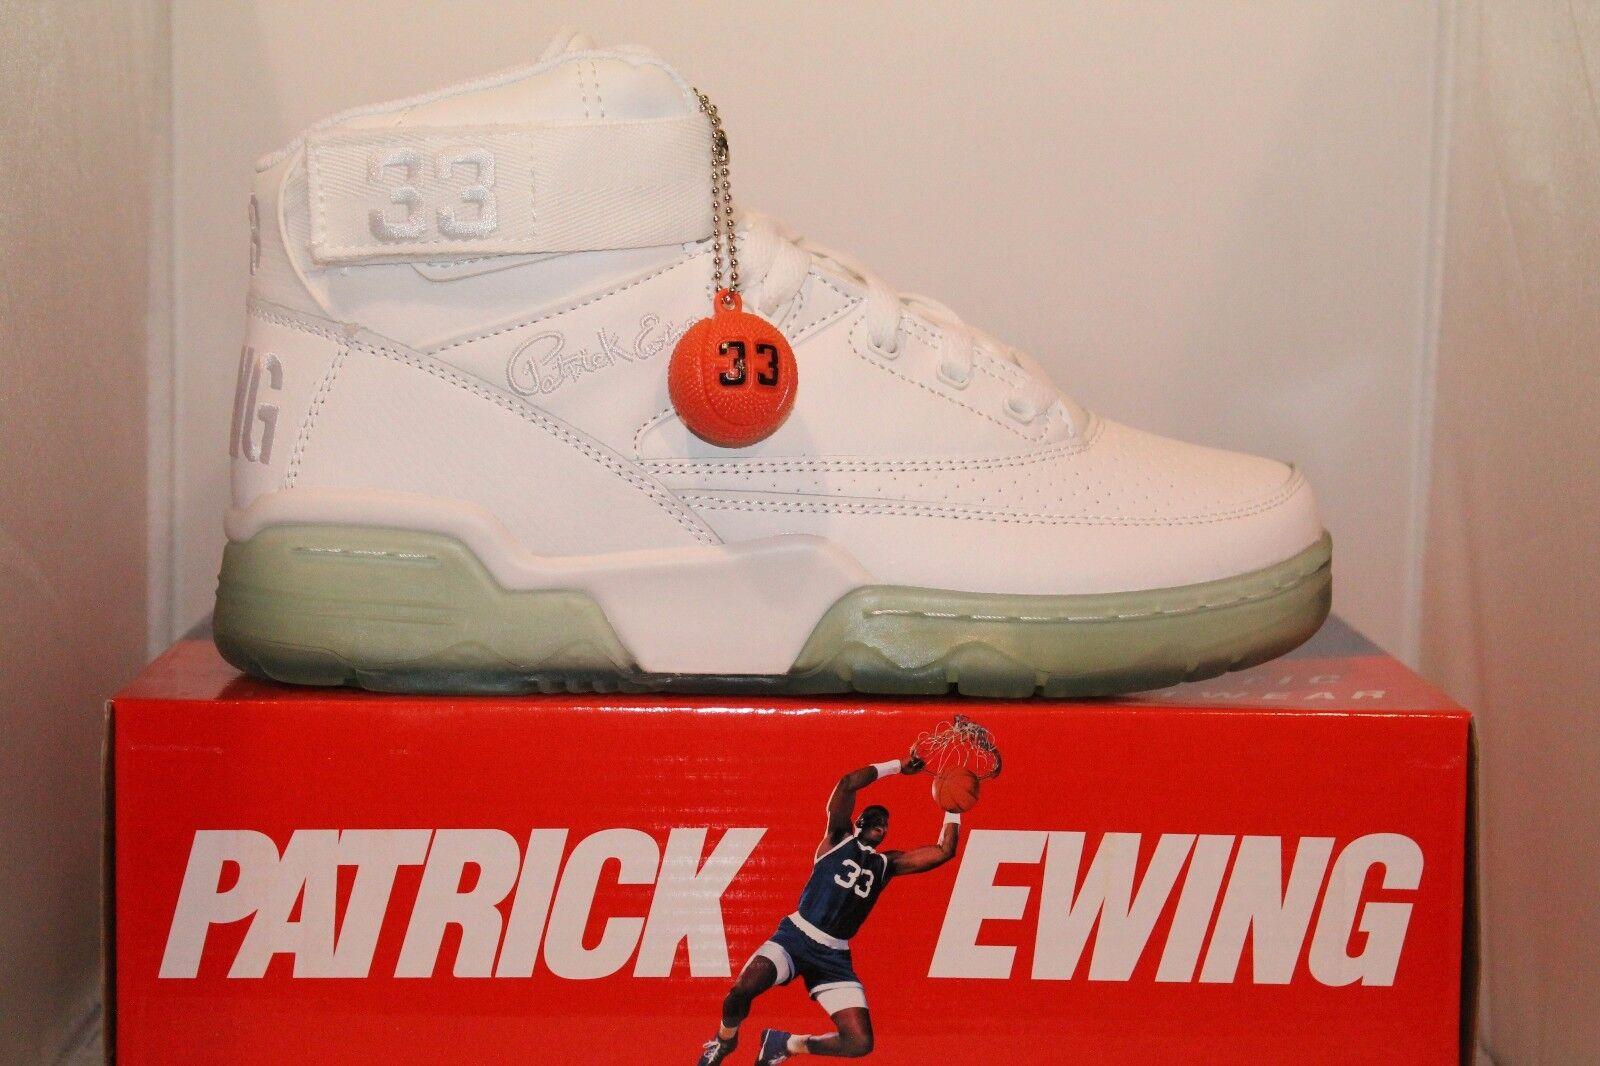 Uomo Patrick Ewing 33 MID Retro WHITE CLEAR ICE GUM Classic Retro MID Basketball Shoes 33cb10